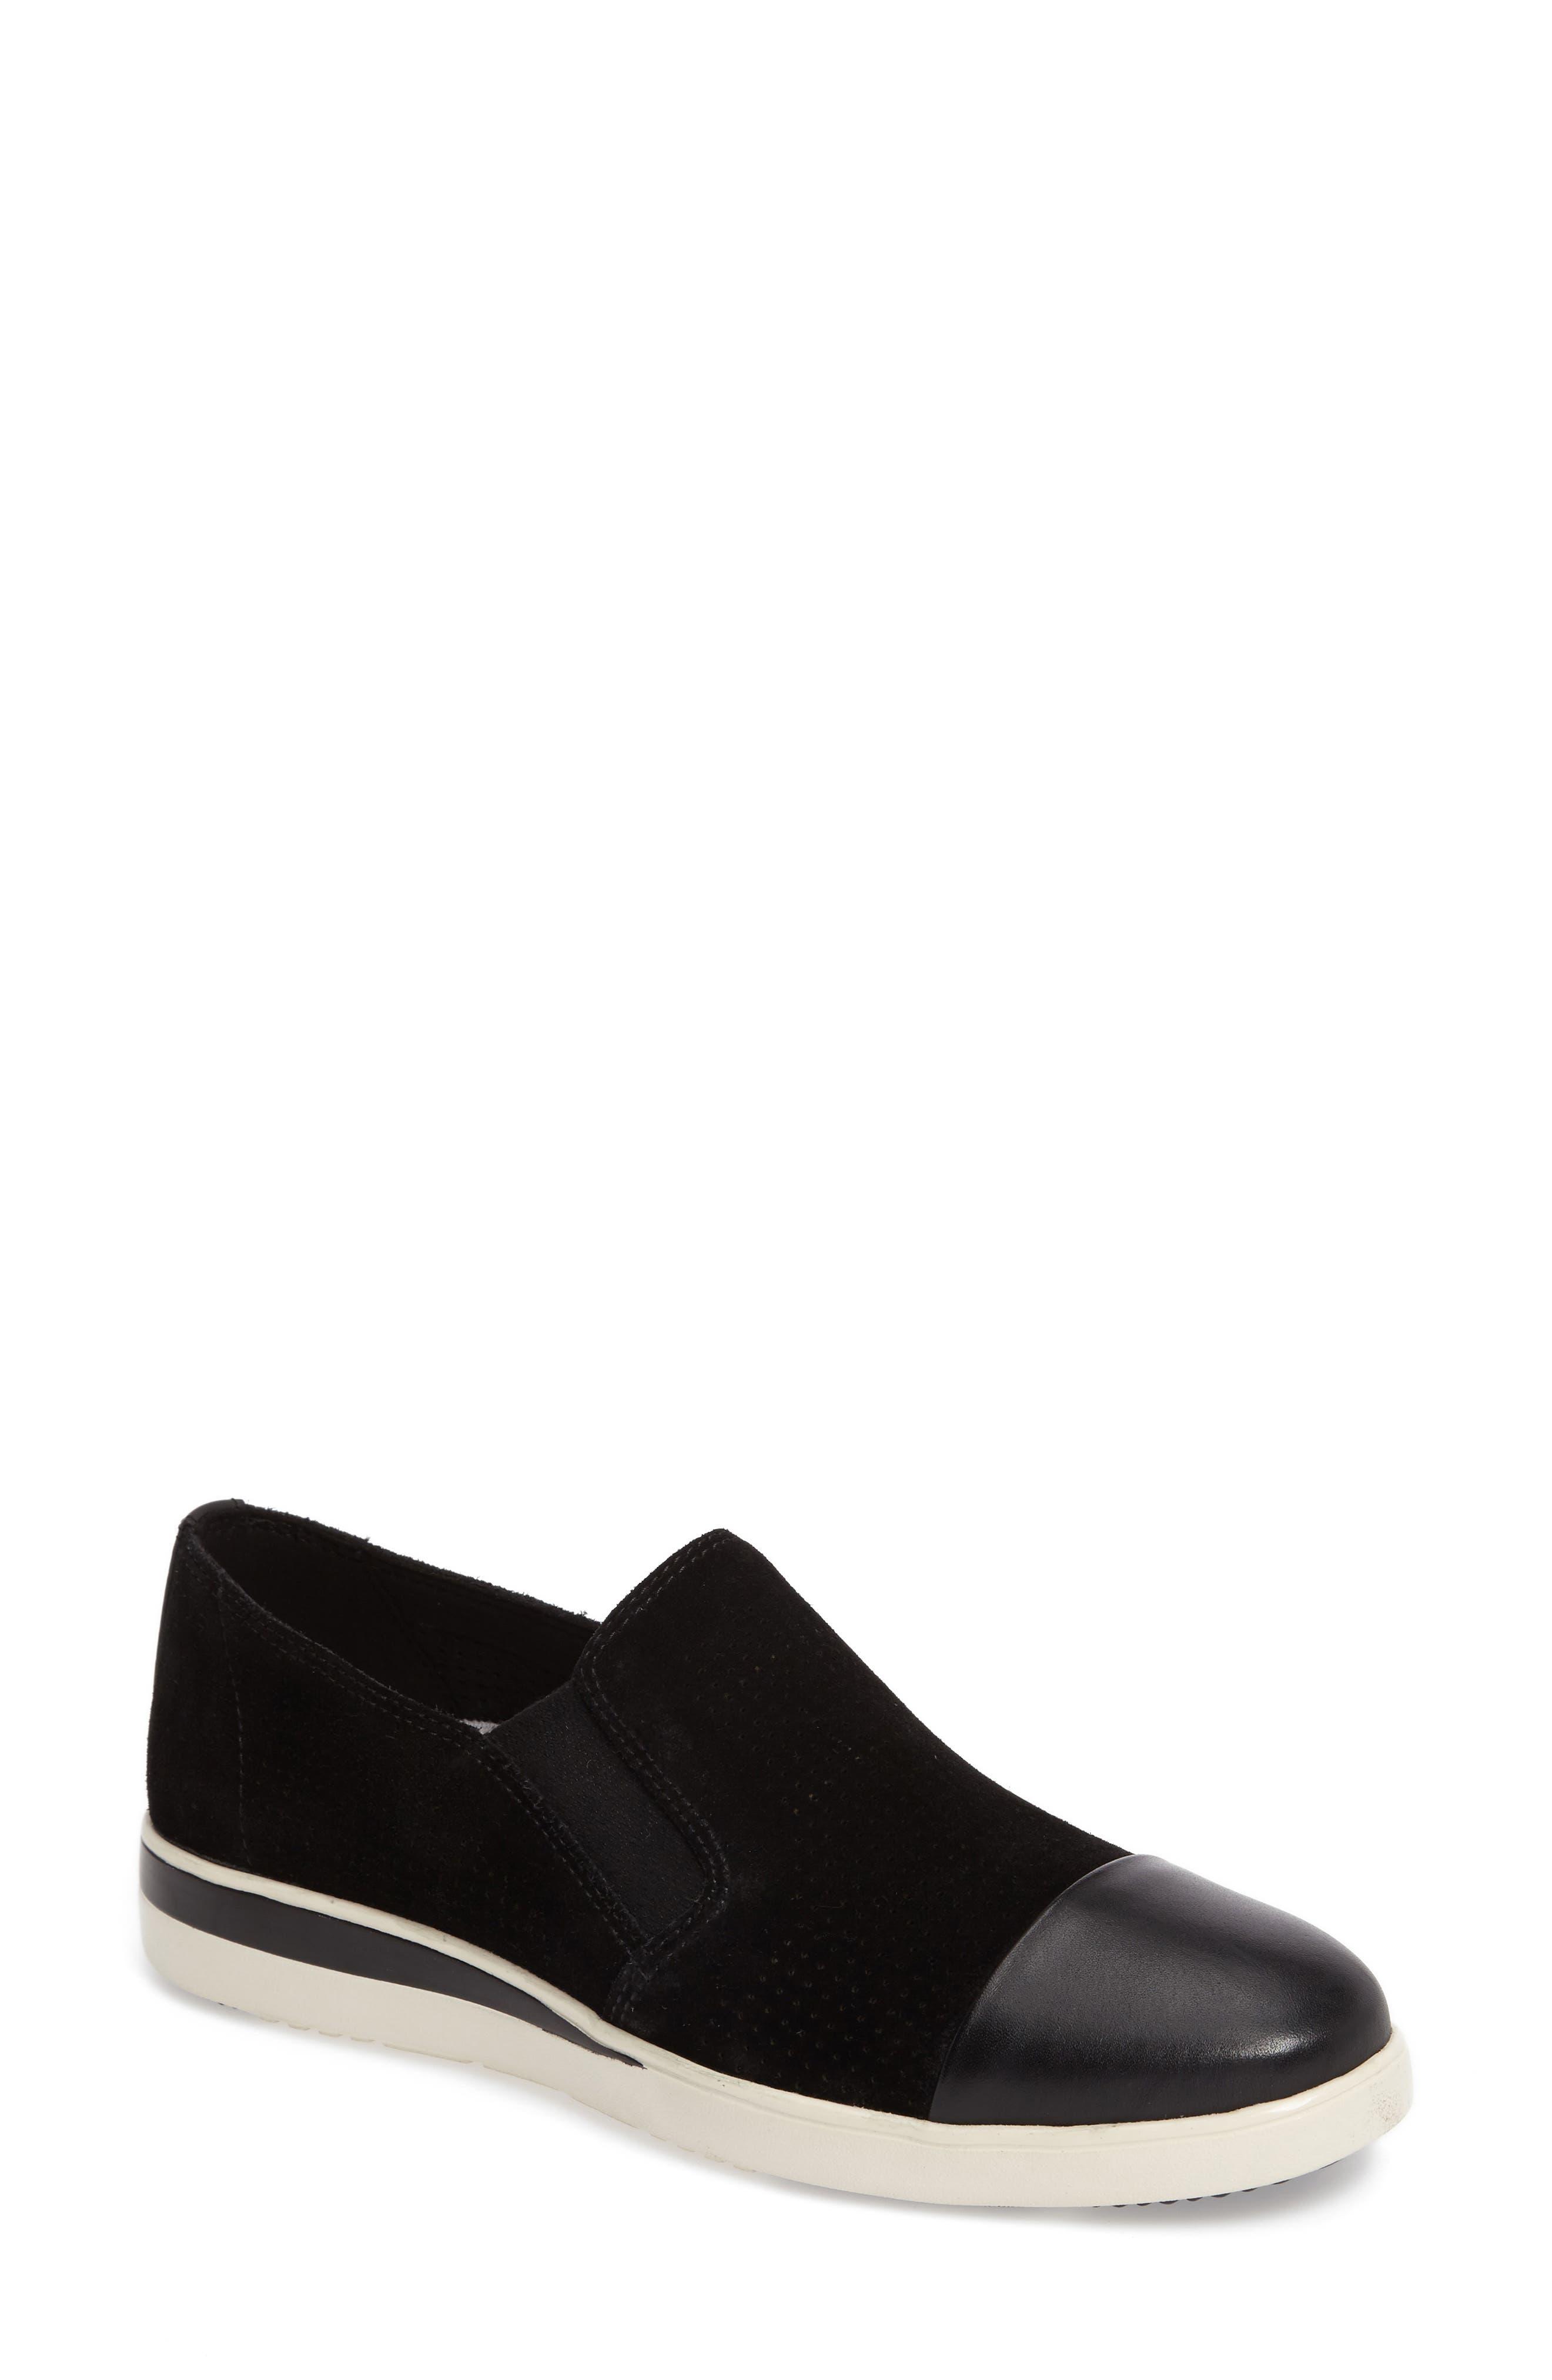 Aviana Cap Toe Slip-On Sneaker,                             Main thumbnail 1, color,                             002